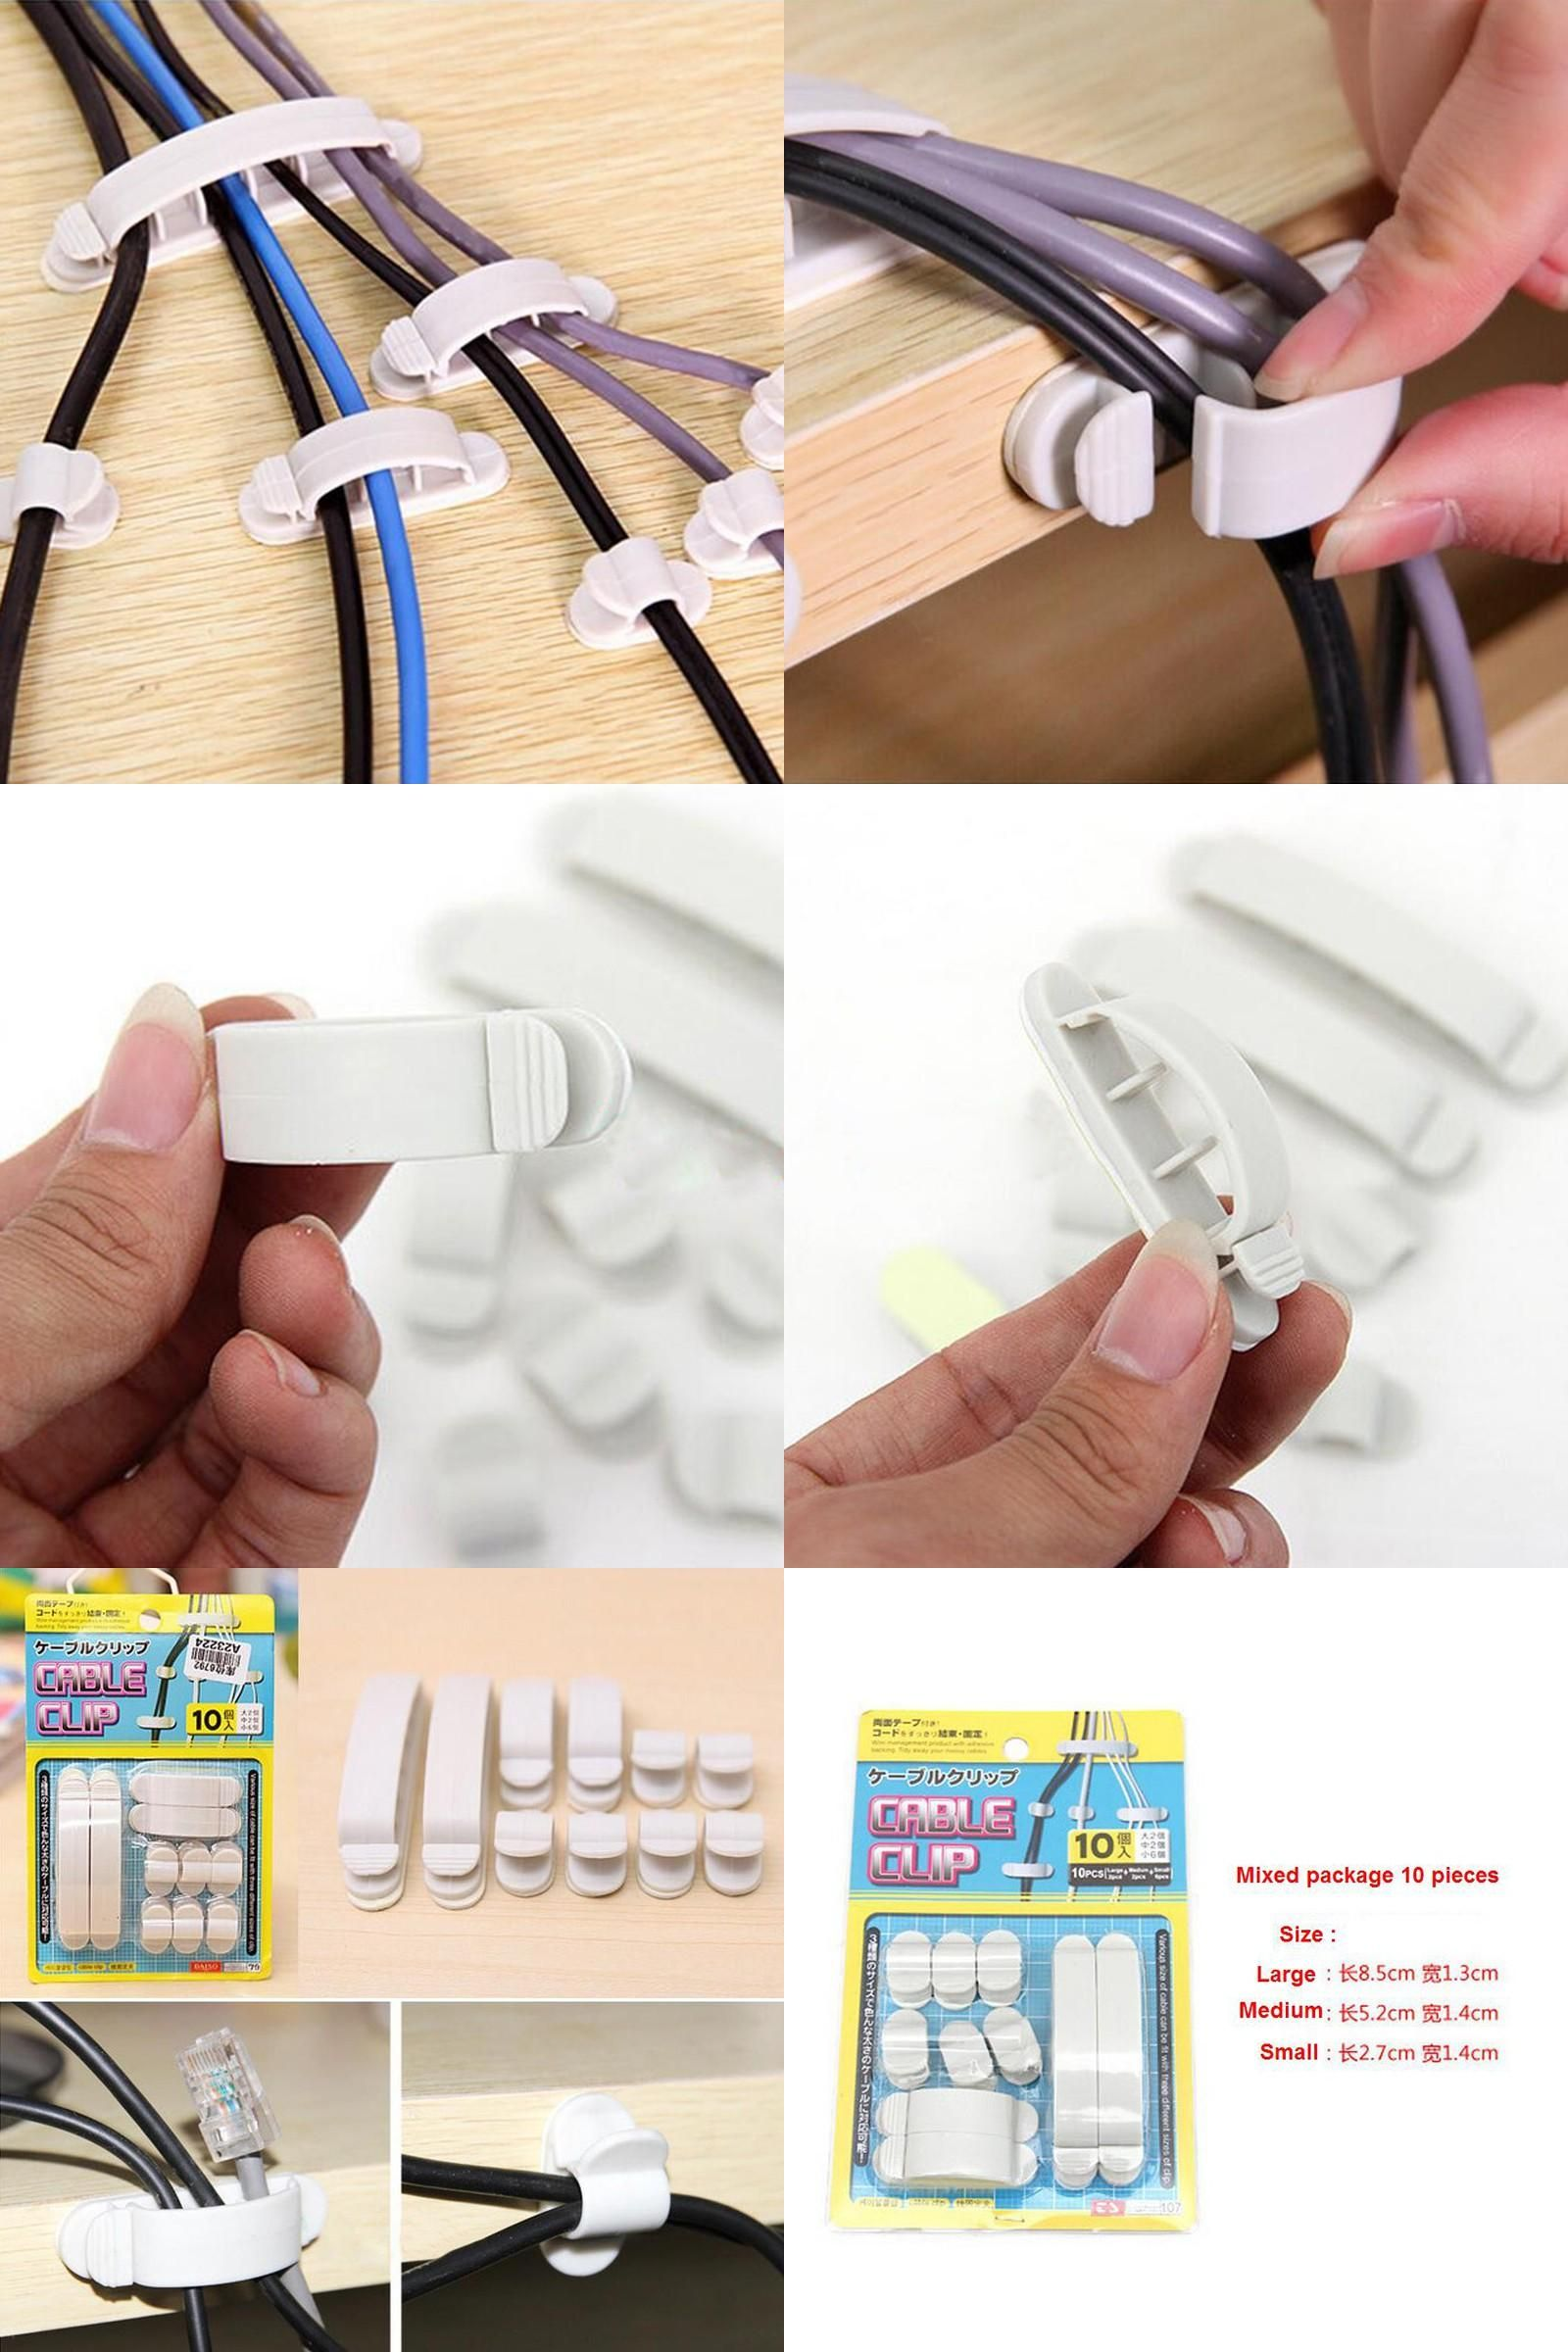 Visit to Buy] Wire Line Organizer Plastic Clips Ties Fixer Fastener ...